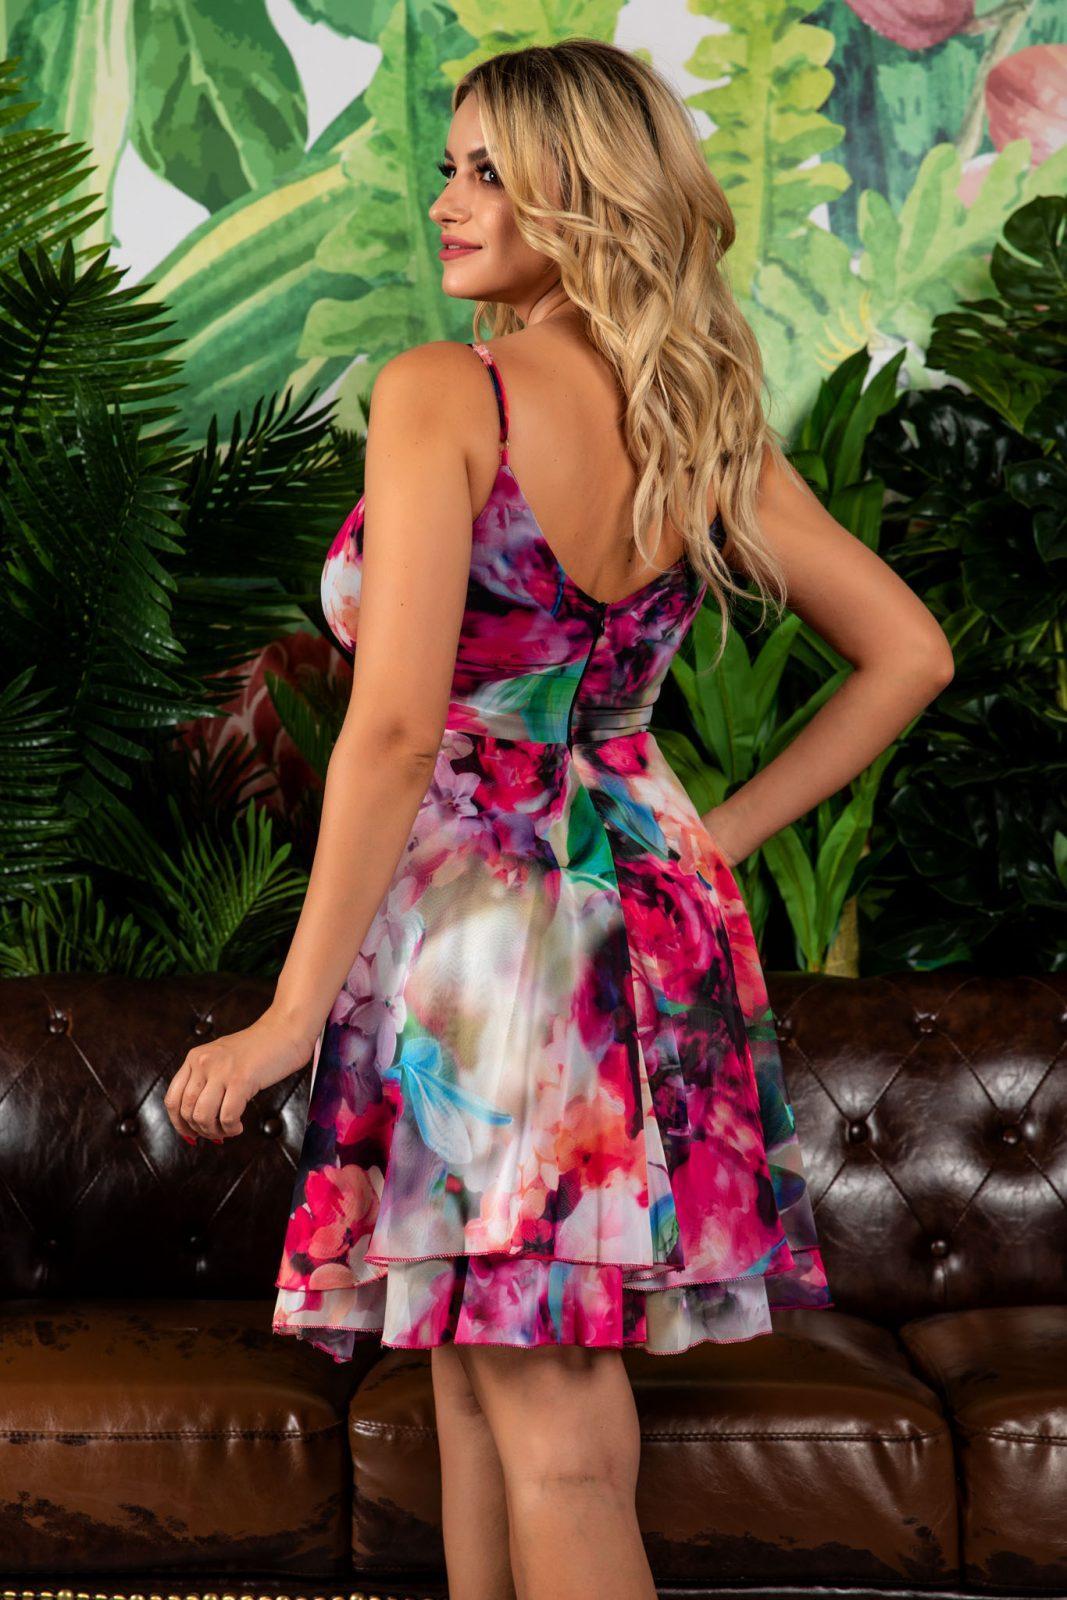 Mini Φόρεμα Με Ρυθμιζόμενες Τιράντες Celyne 7812